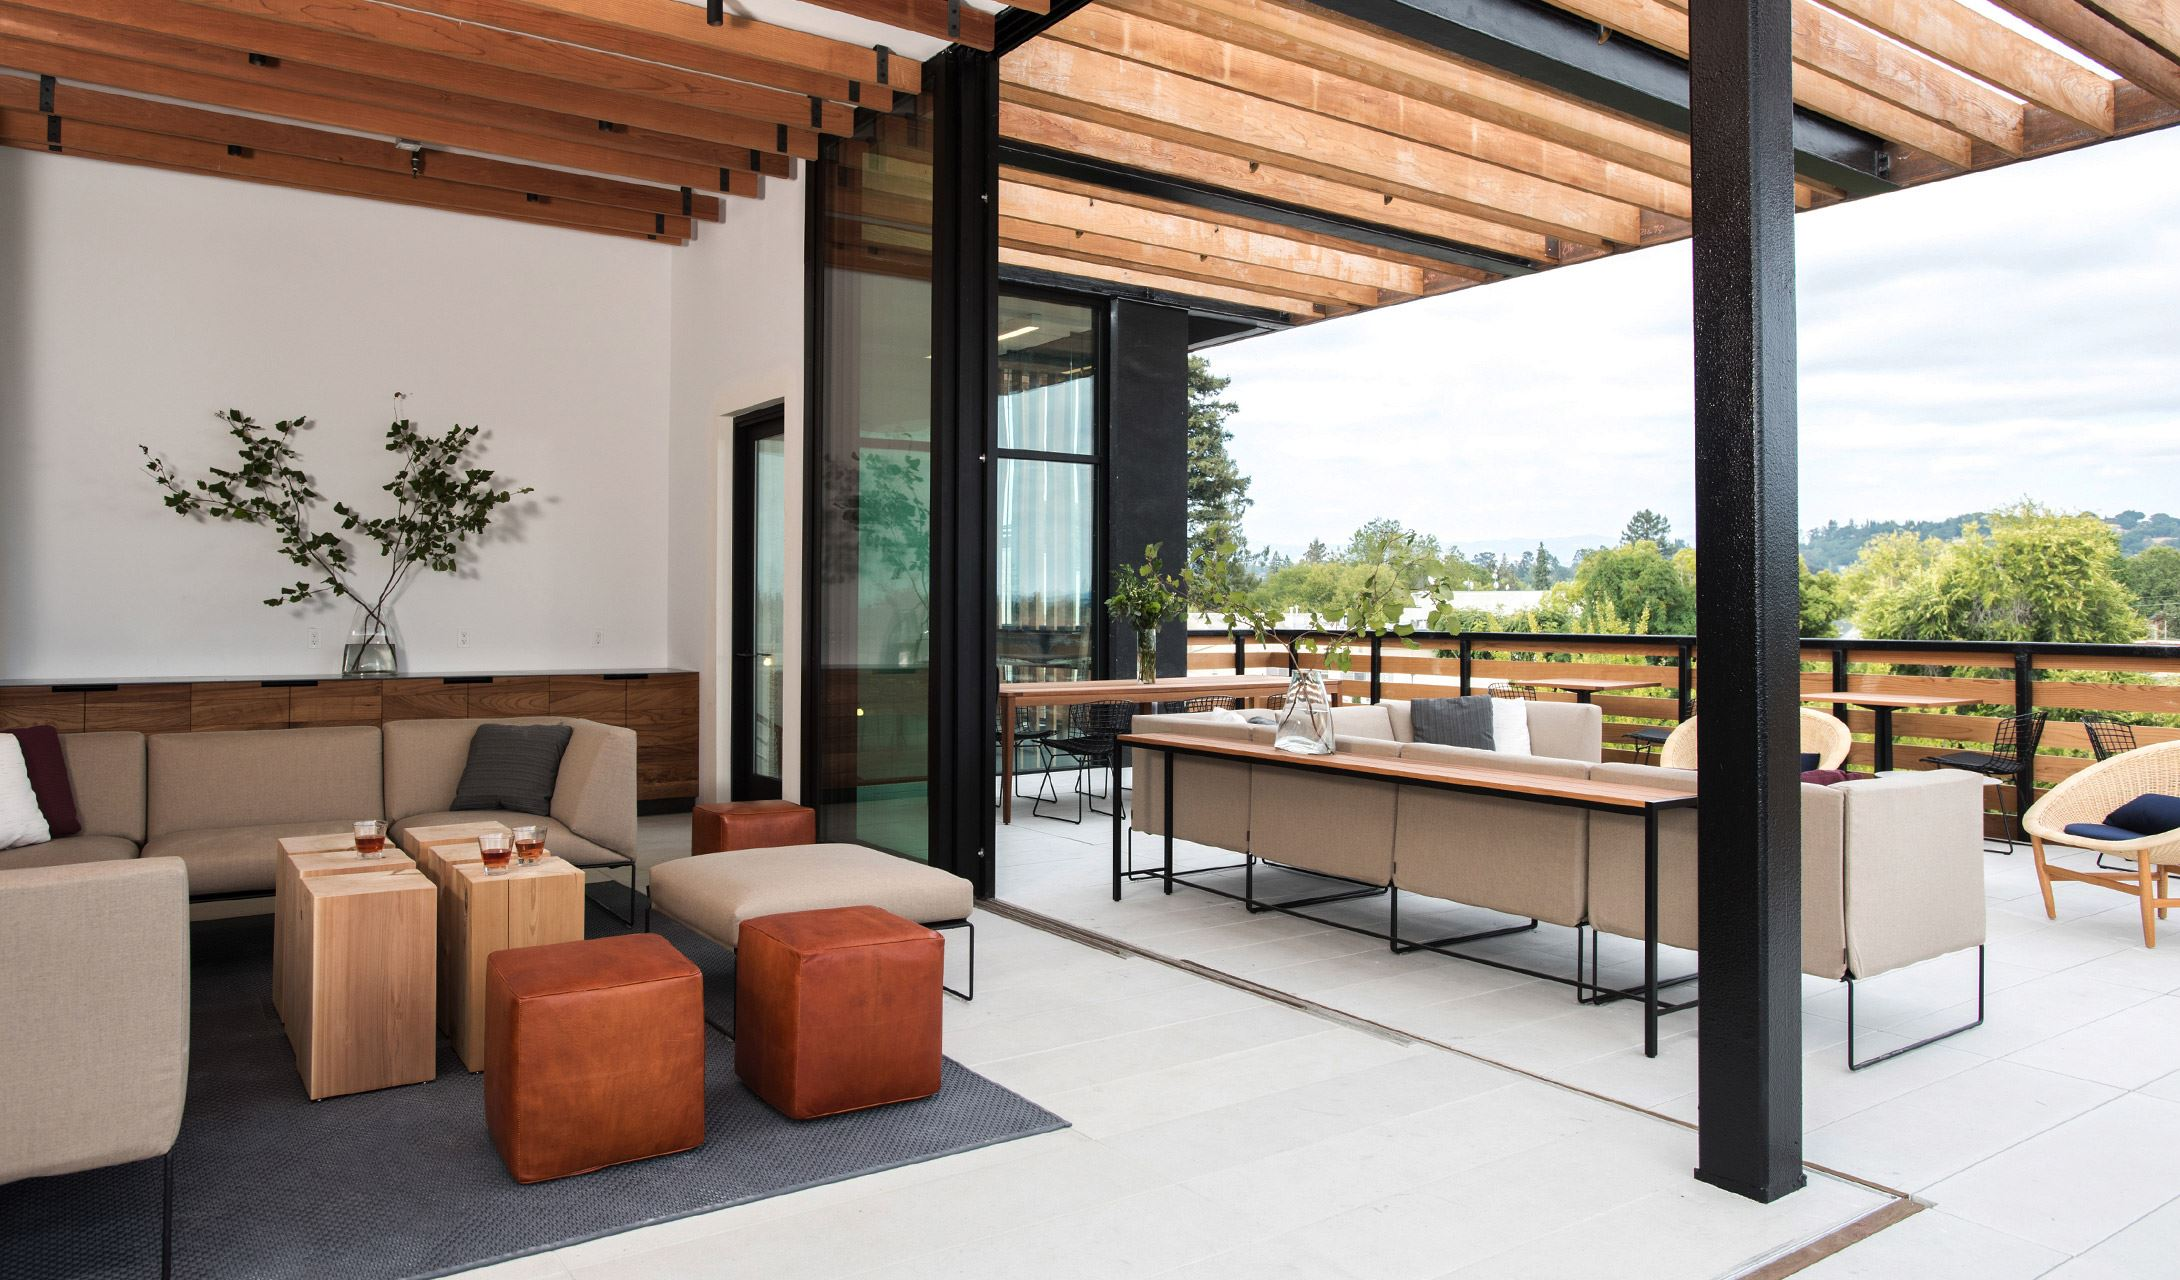 Harmon Guest House - Boutique Sustainable Hotel Healdsburg, California